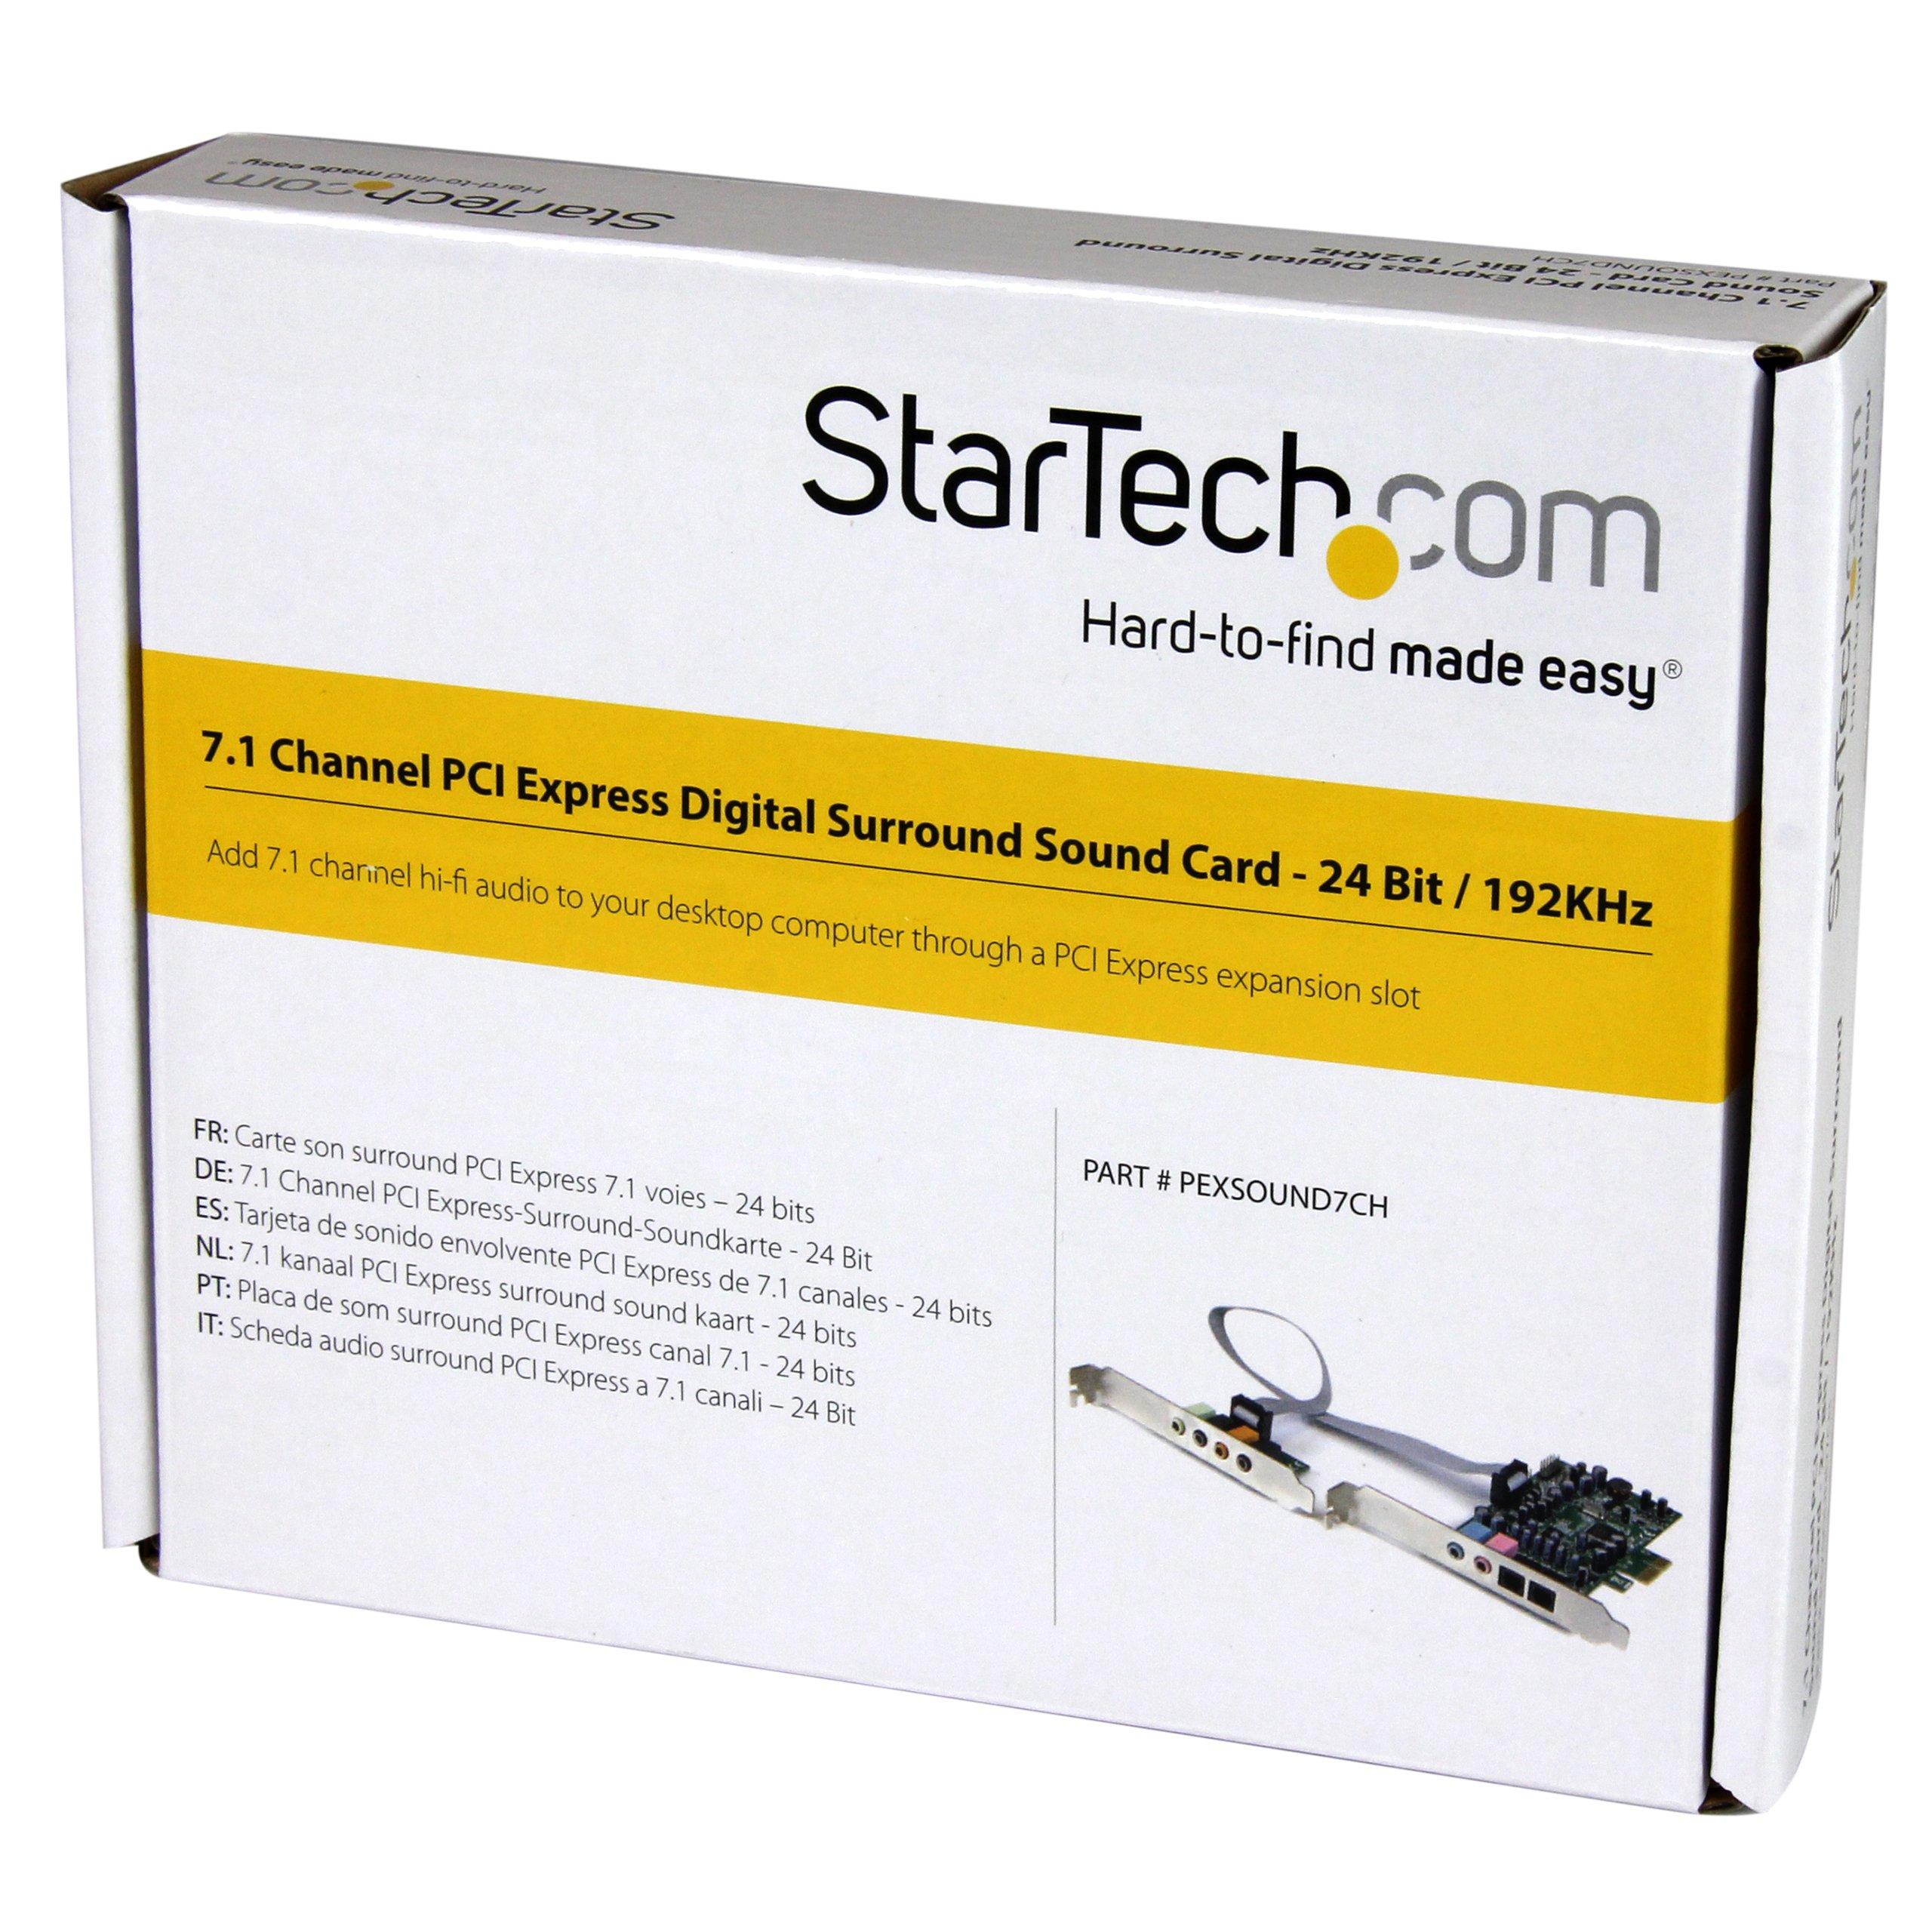 StarTech.com 7.1 Channel Sound Card, PCI Express PEXSOUND7CH by StarTech